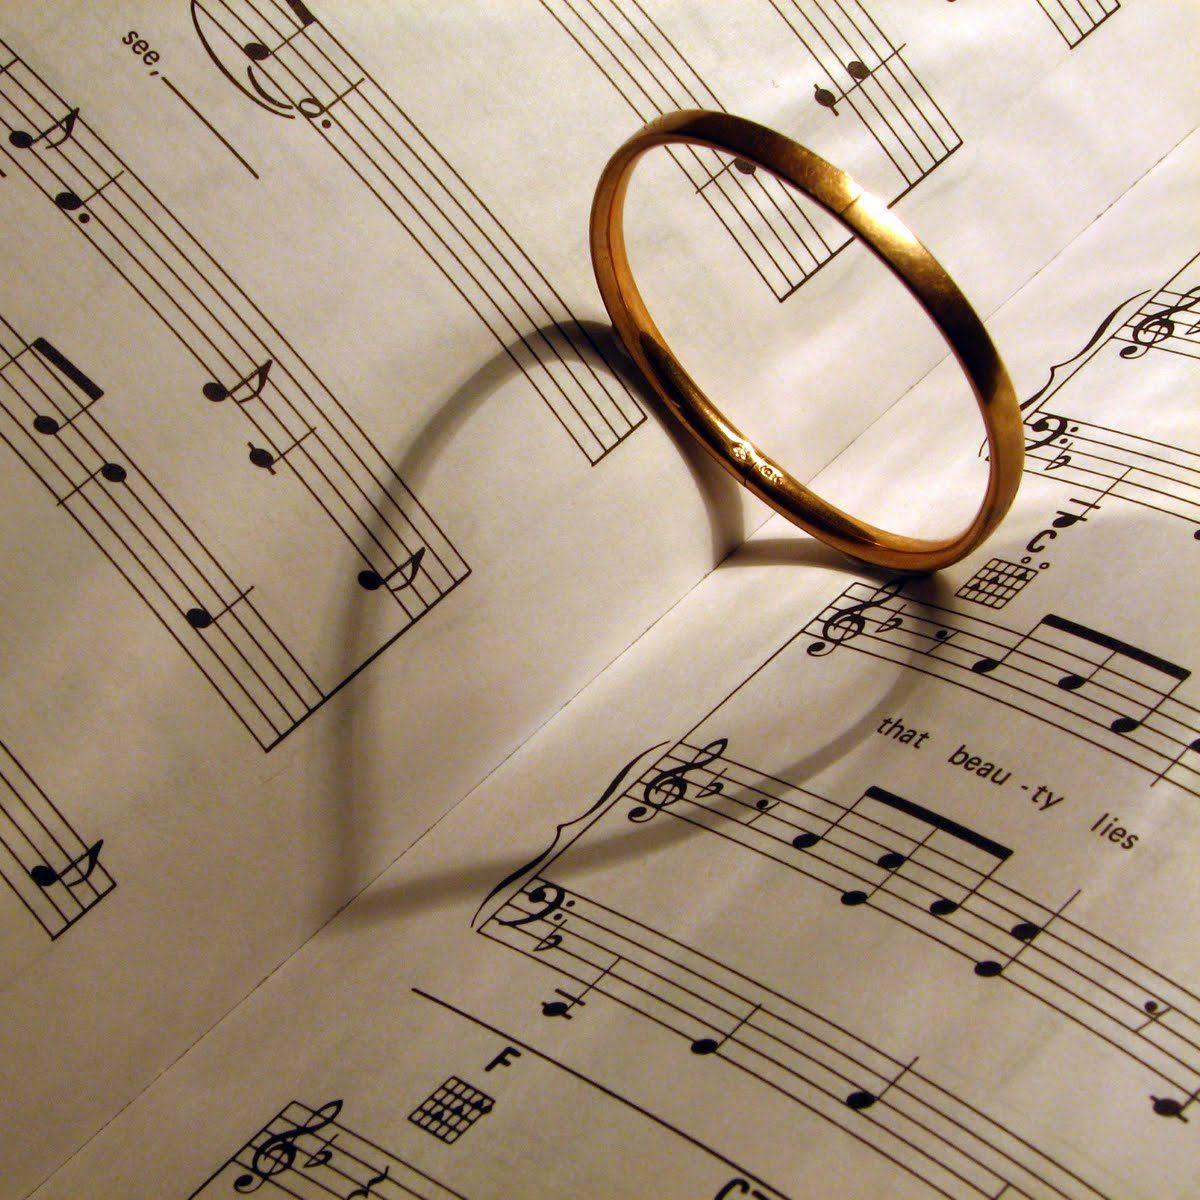 Wedding ring making heart shaped shadow on sheet music.